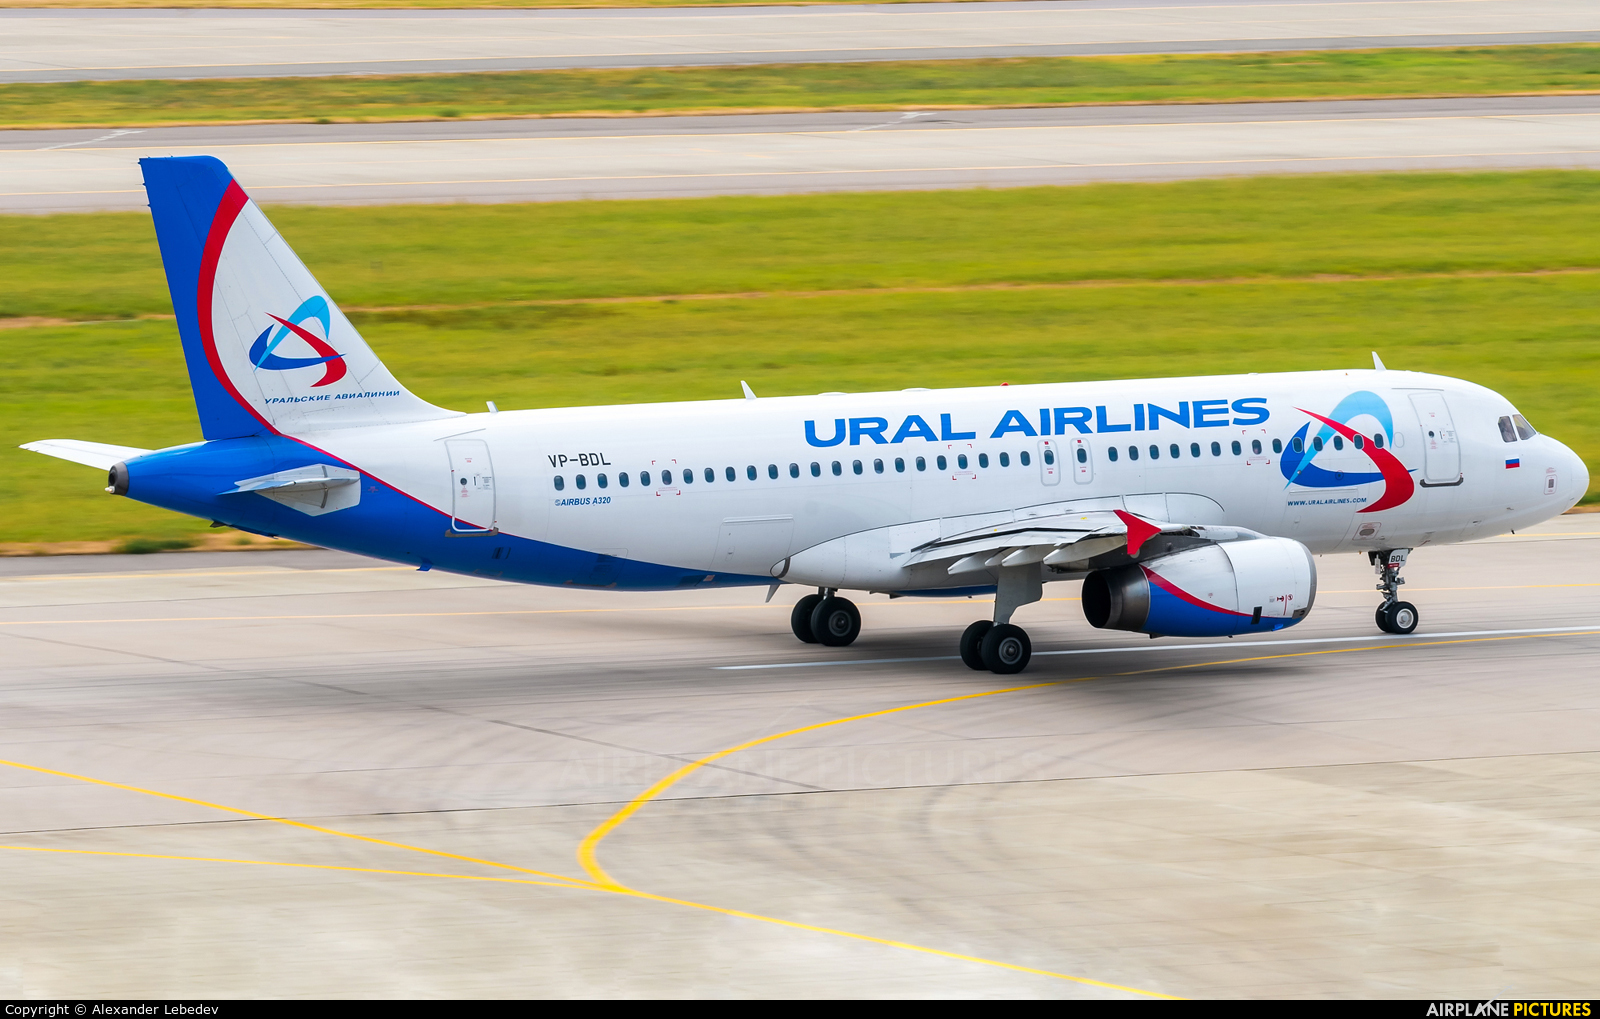 Ural Airlines VP-BDL aircraft at Sochi Intl